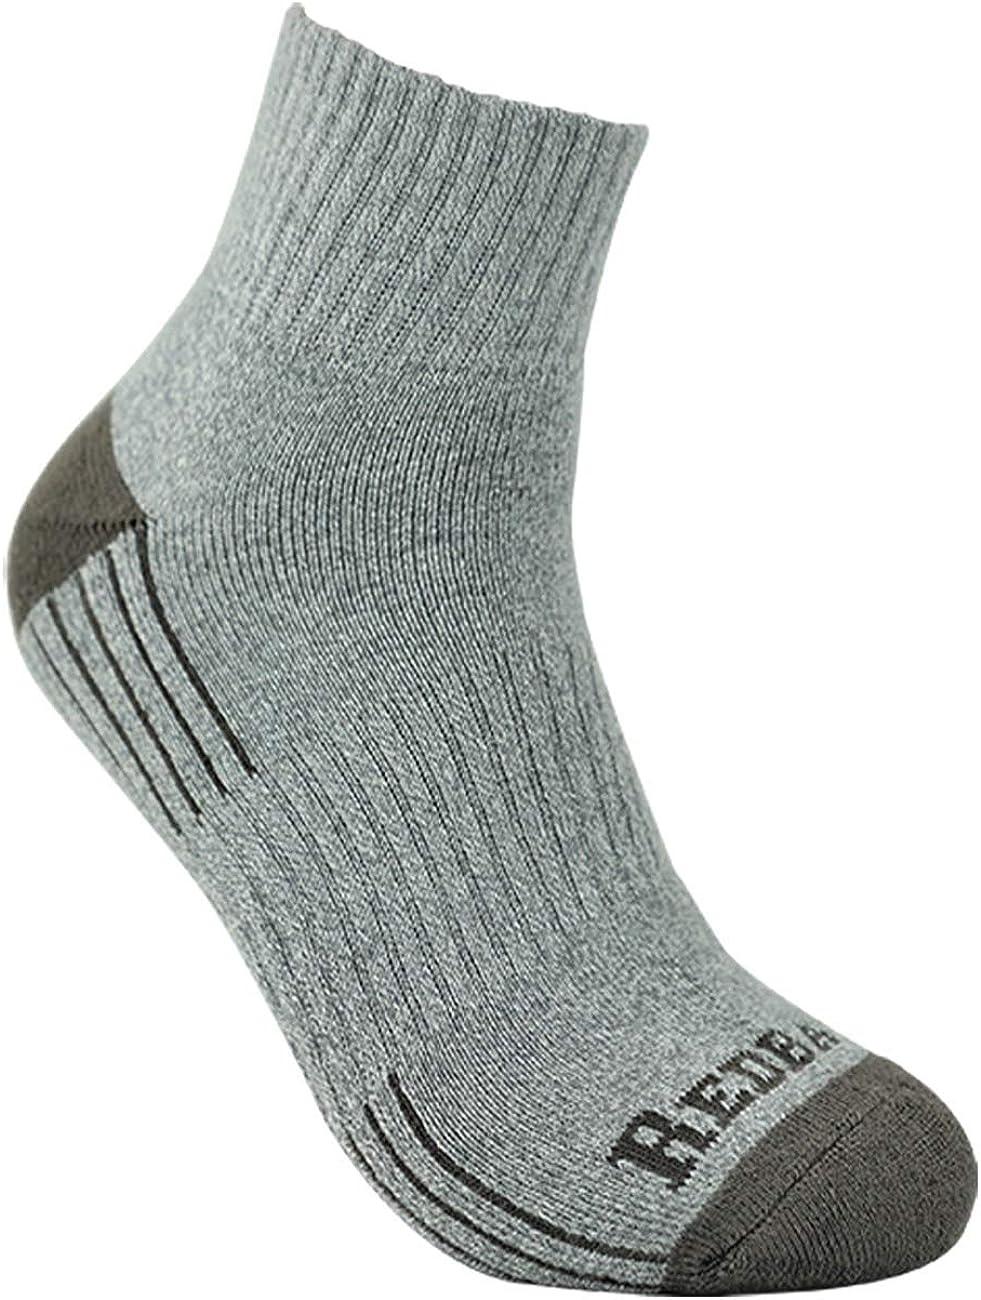 6 Pack Redback Boots Everyday Quarter Ankle Sock LIGHT GREY